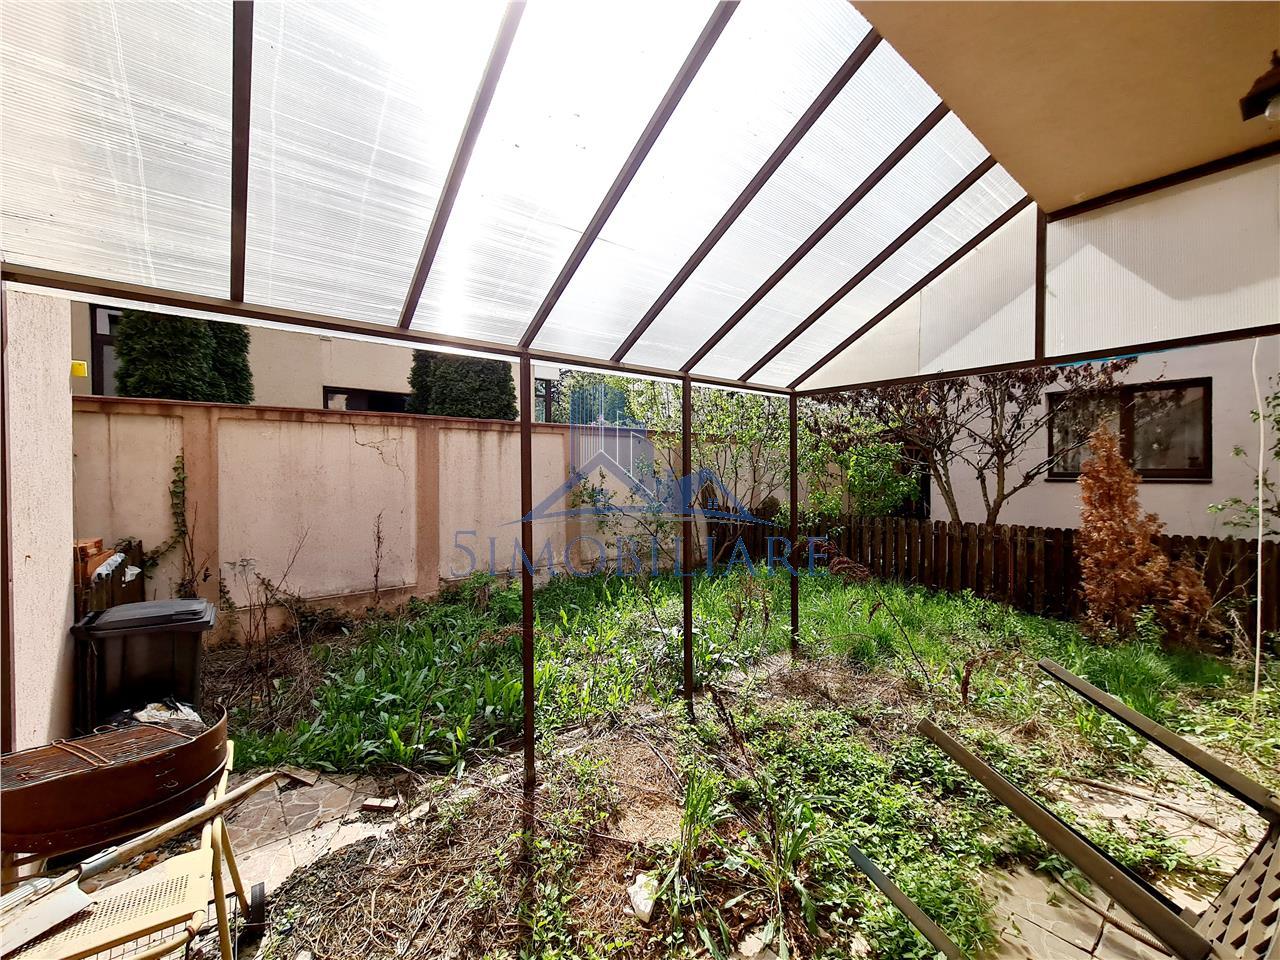 Casa de vanzare in Mogosoaia - Tur Video atasat